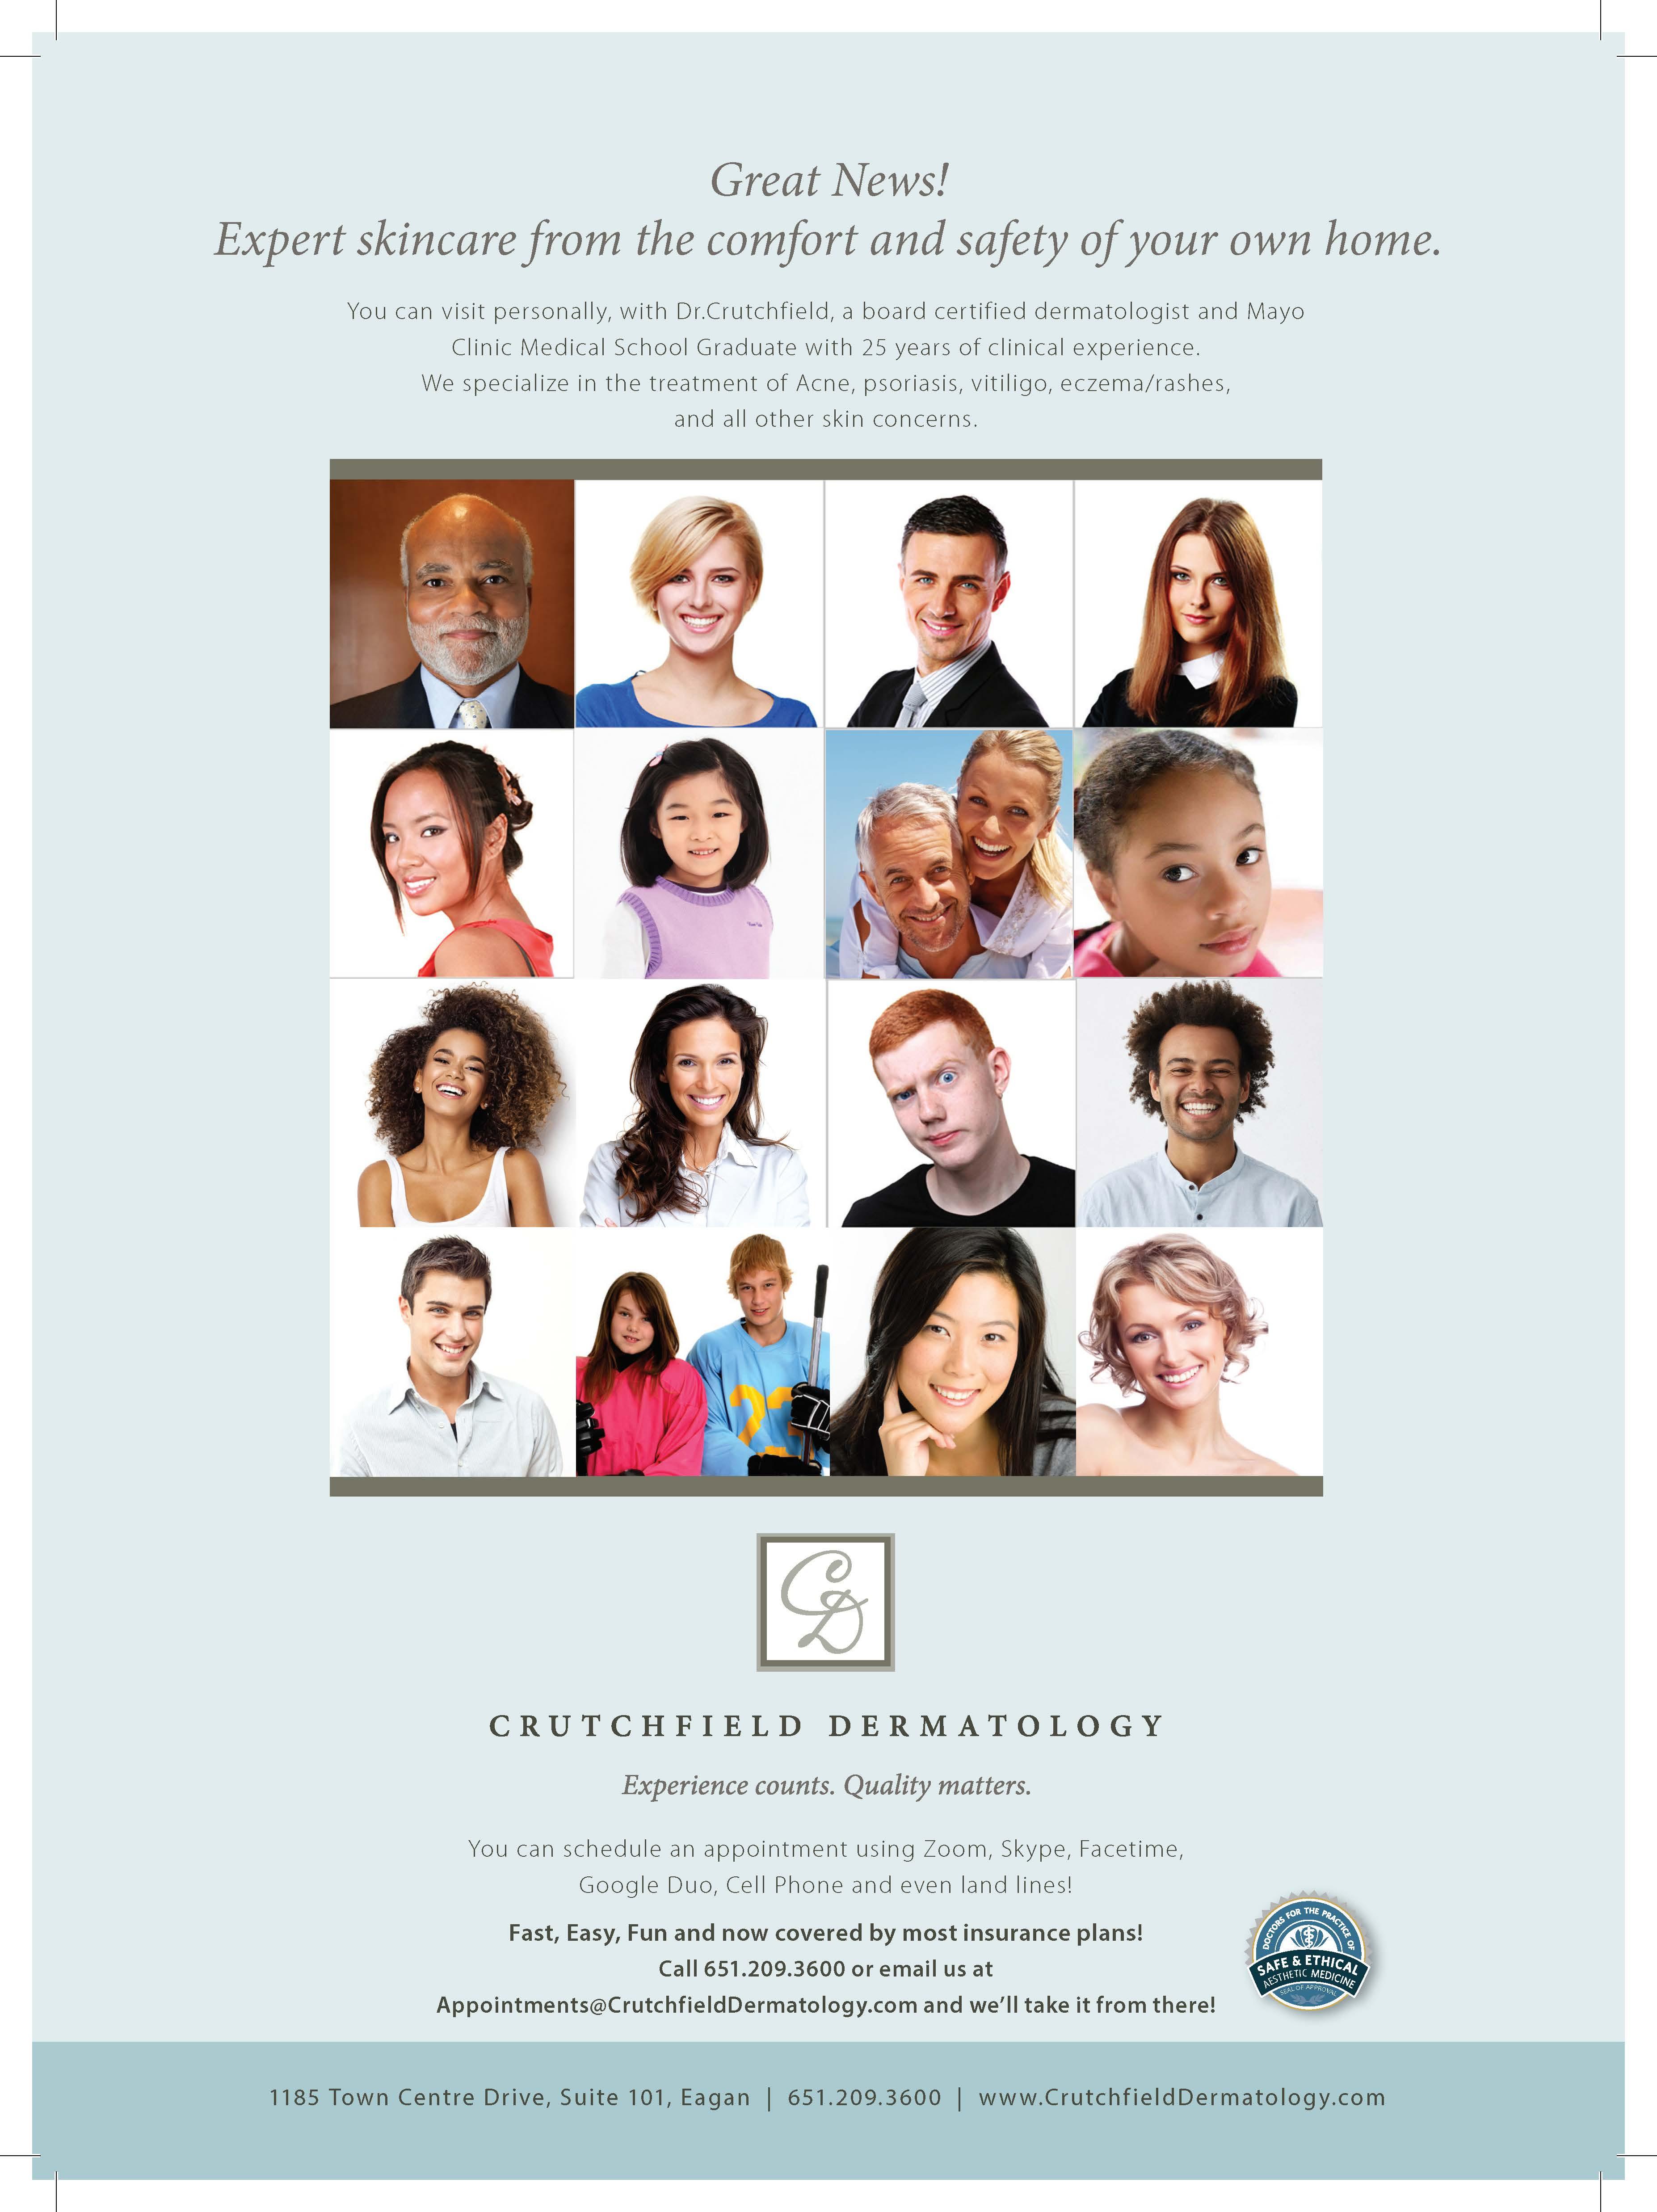 Crutchfield Dermatology Virtual Ad 2